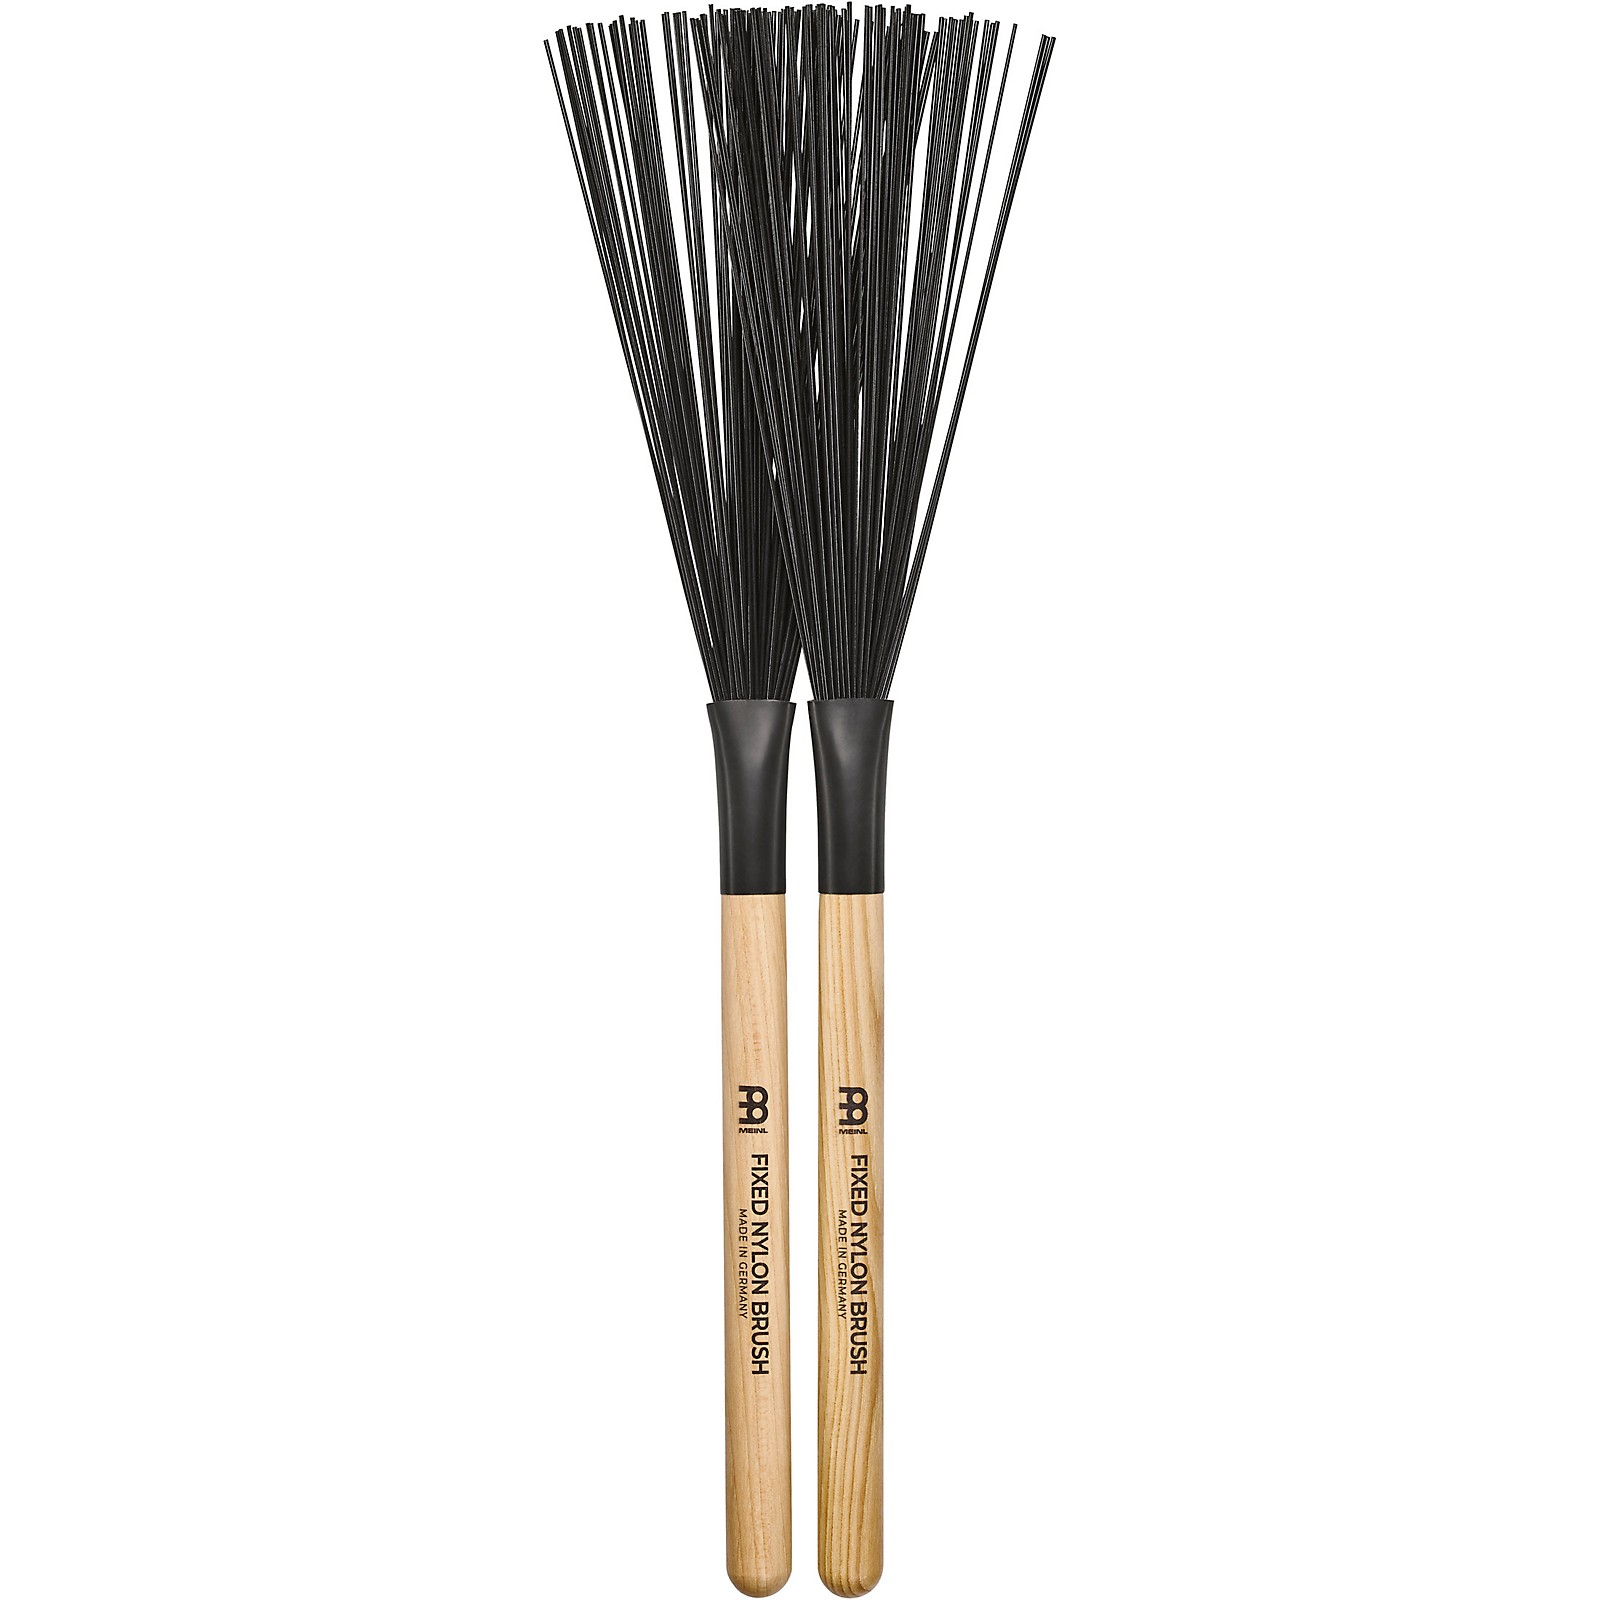 Meinl Stick & Brush Fixed Nylon Brushes